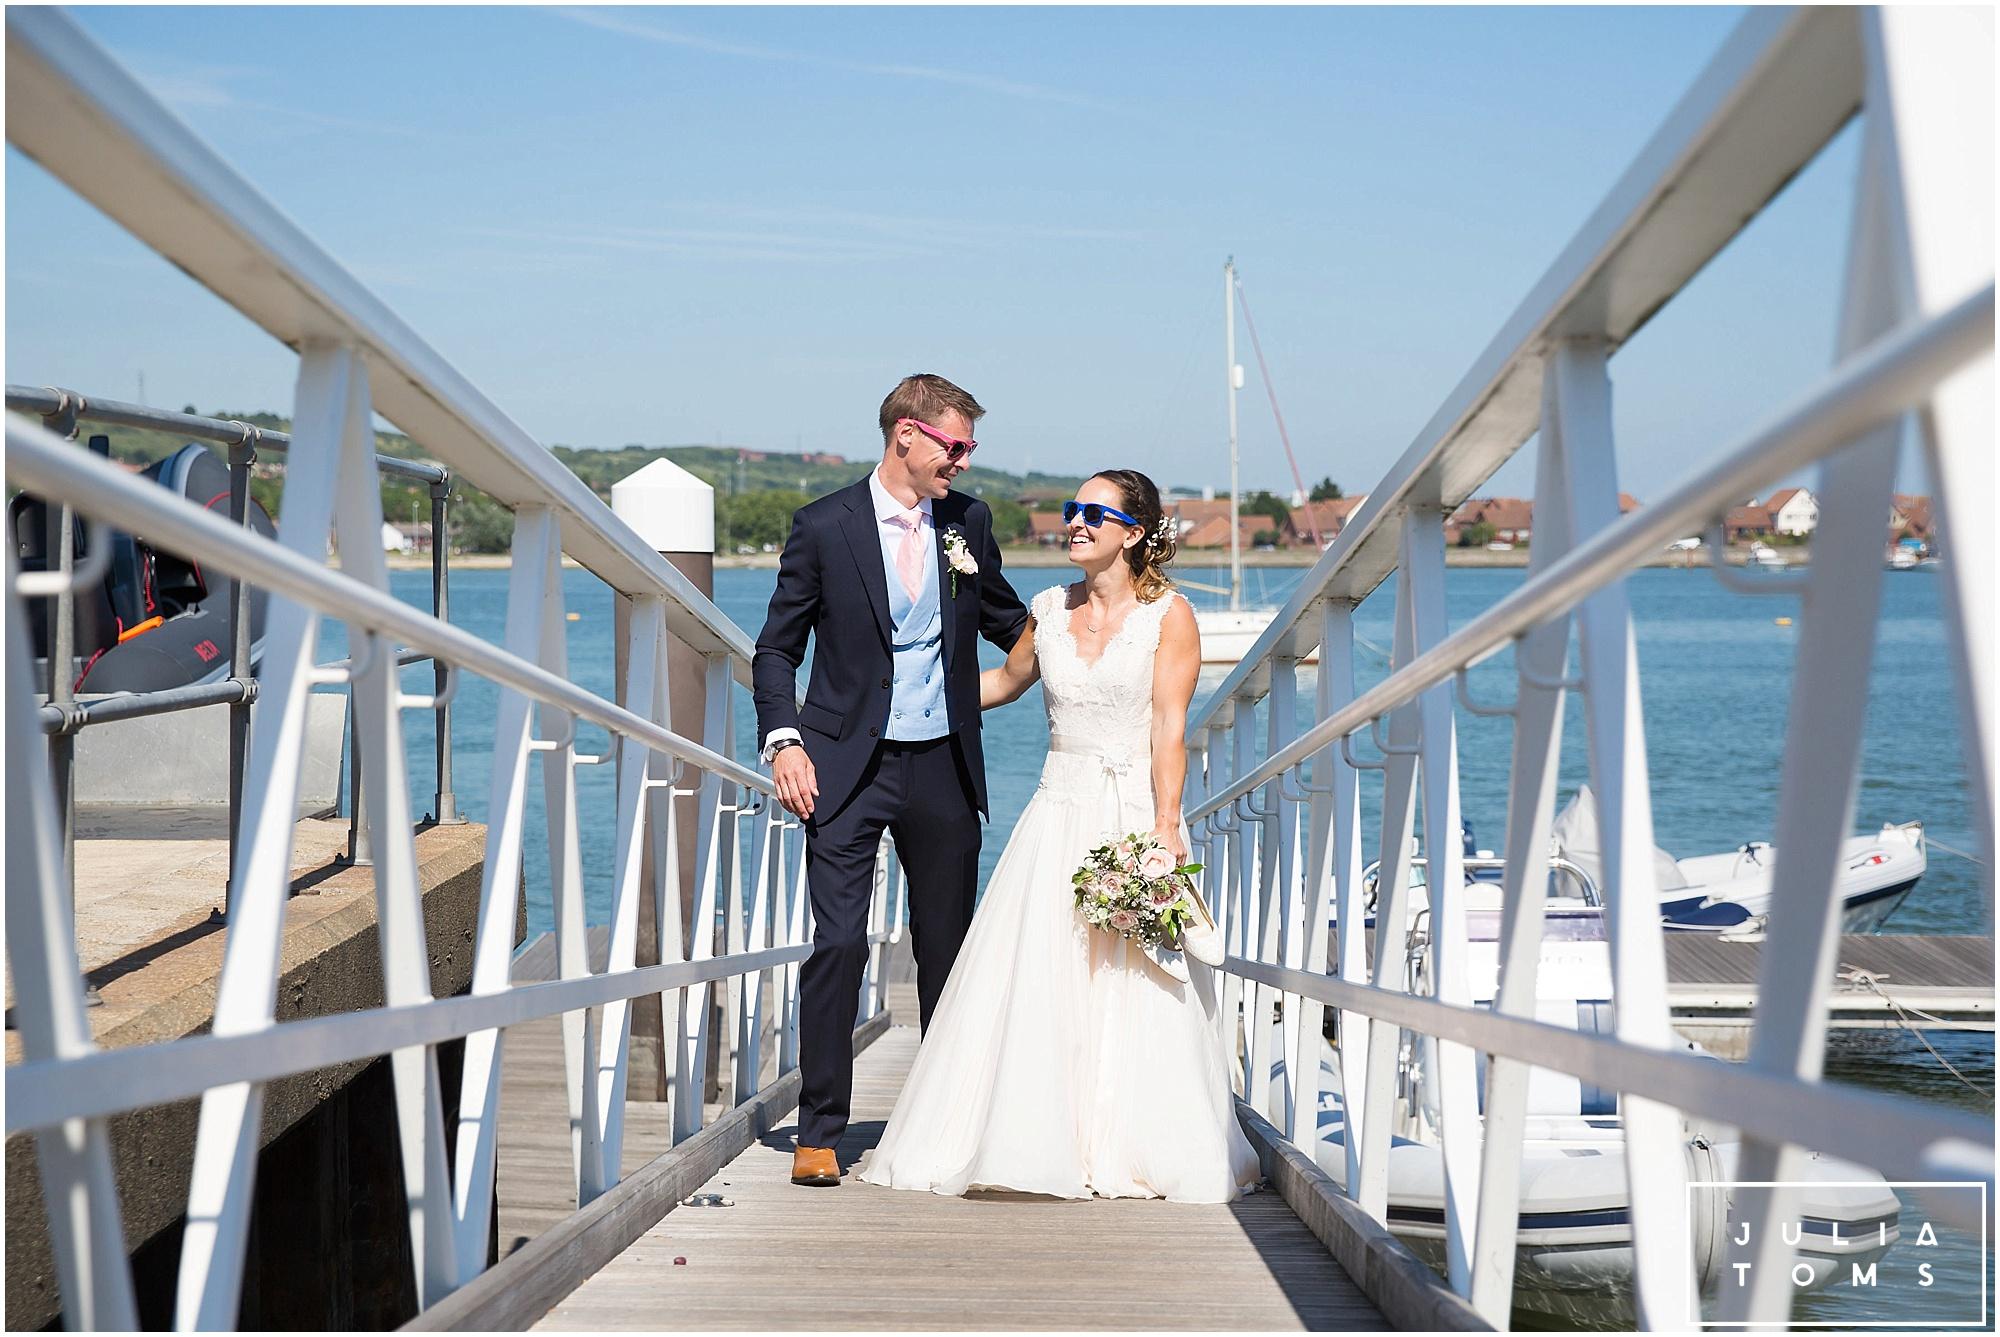 julia_toms_chichester_wedding_photographer_portsmouth_042.jpg